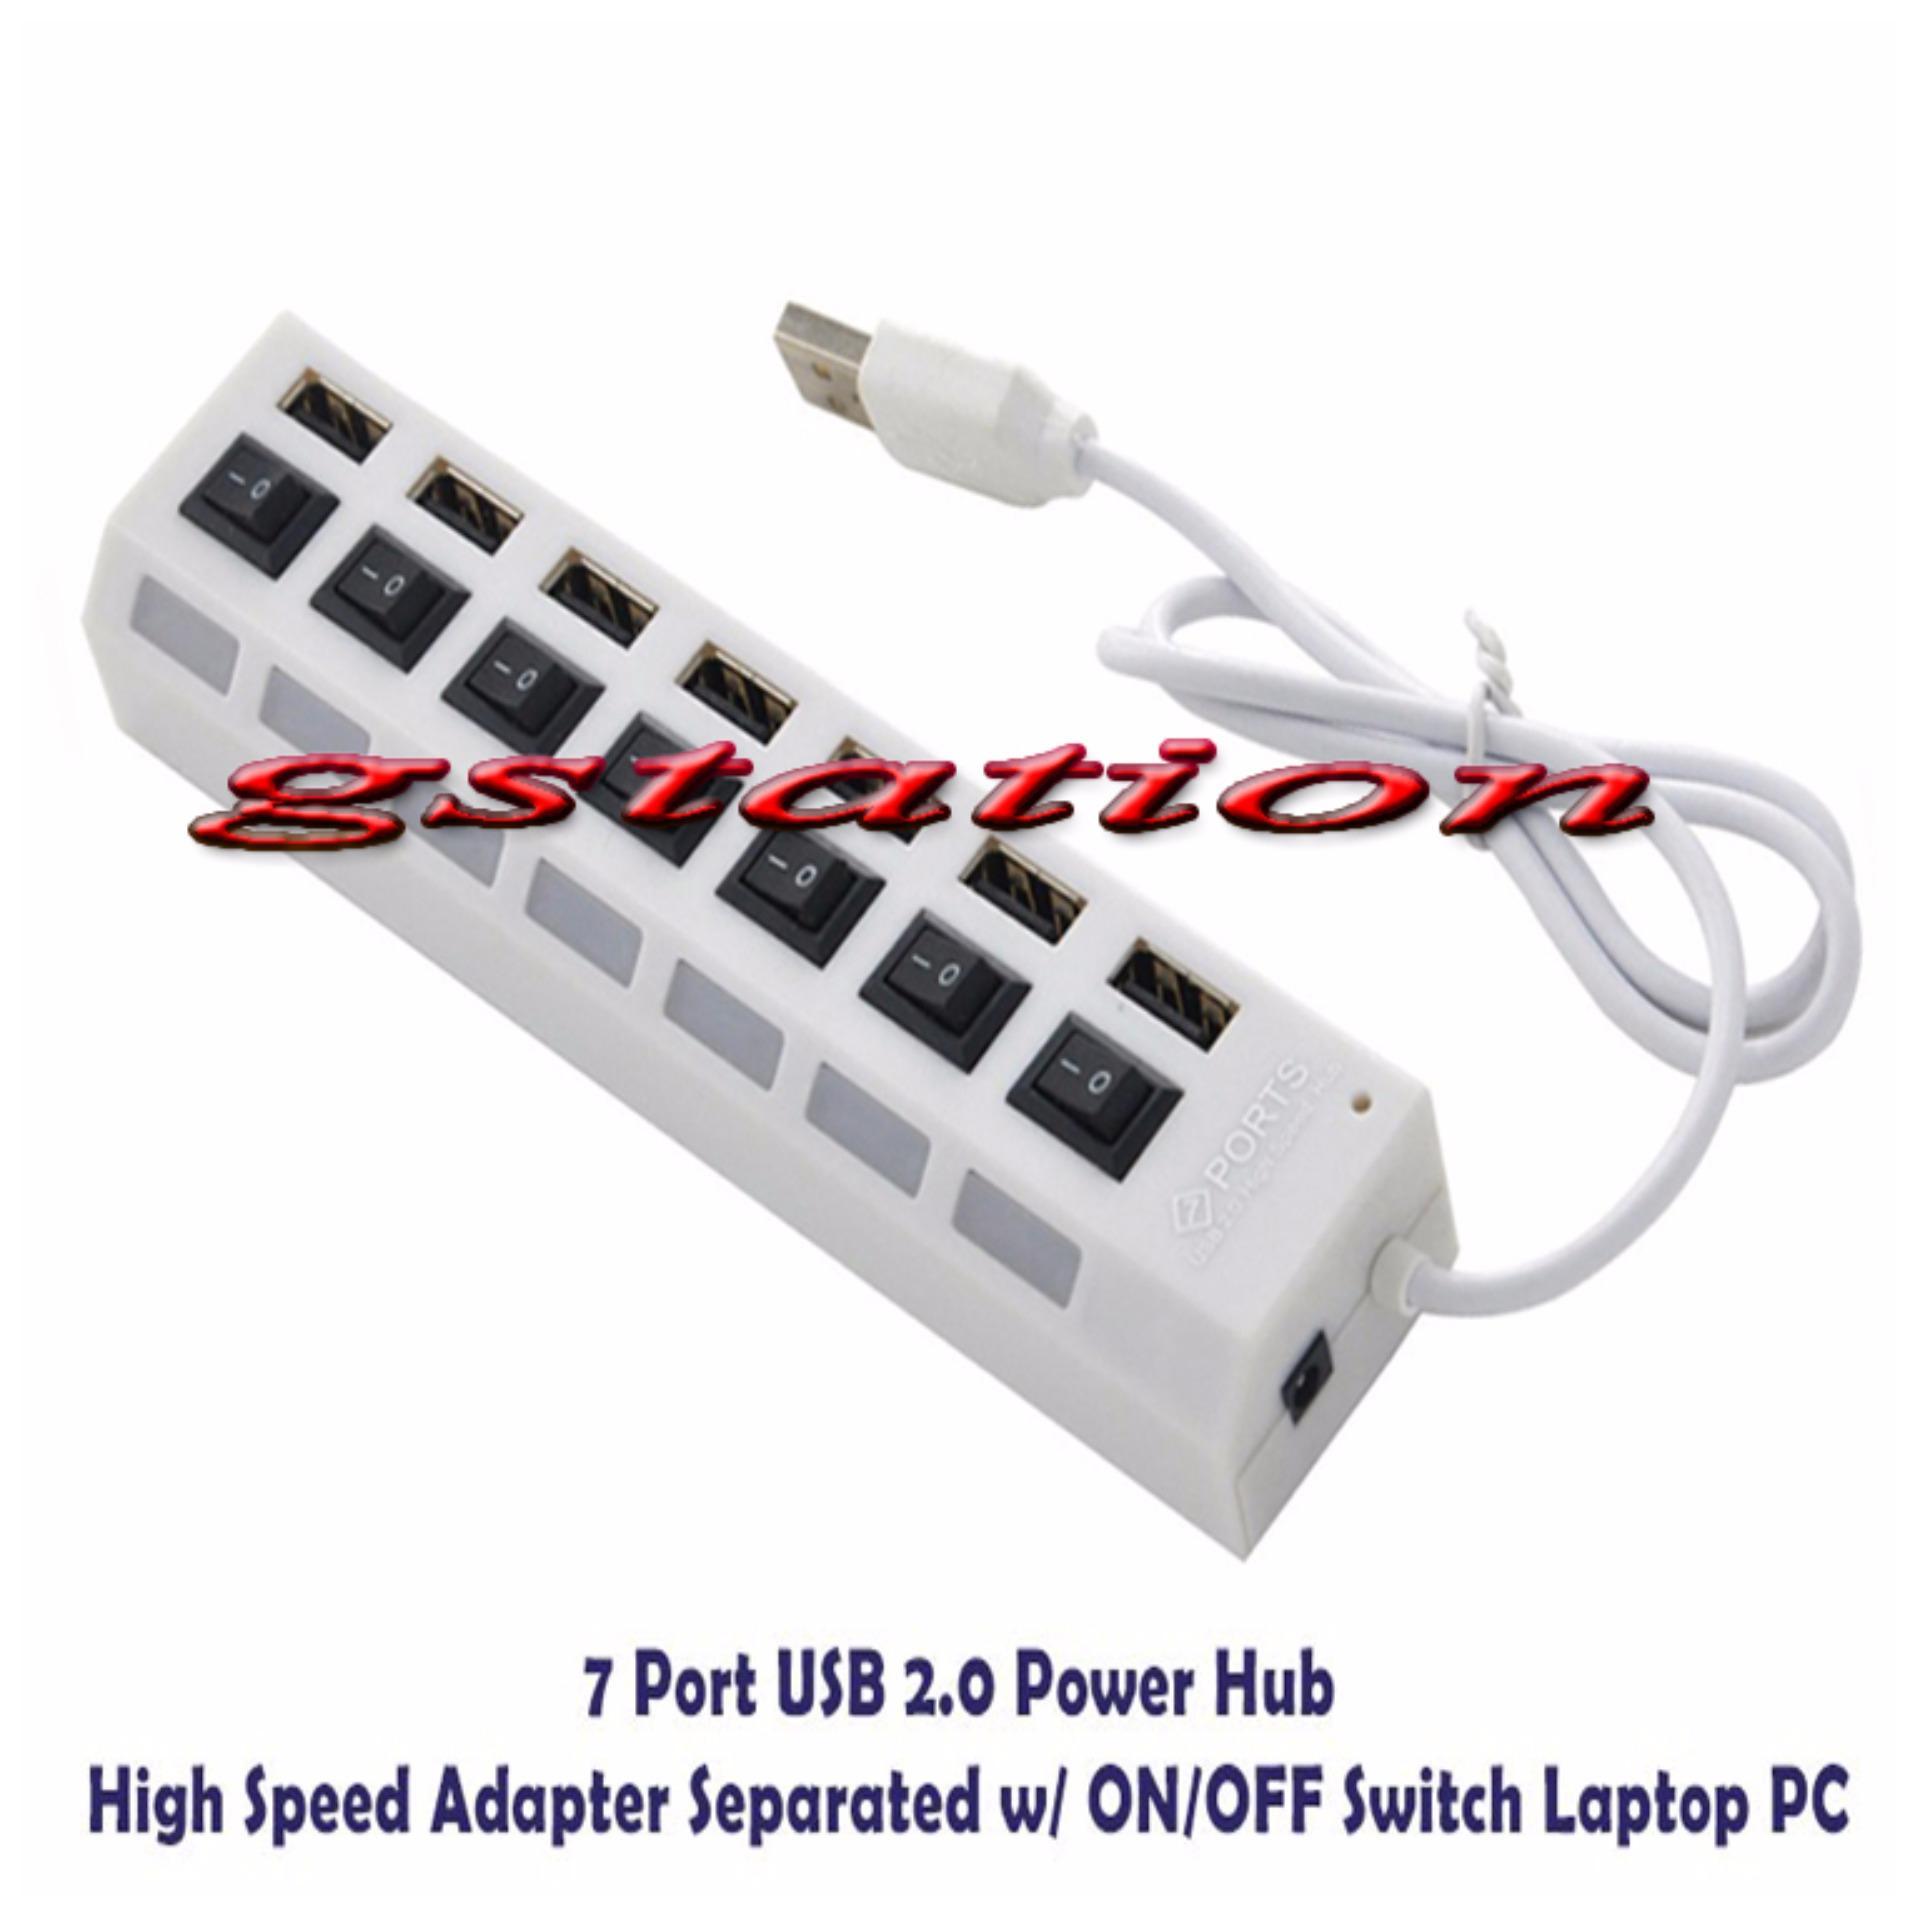 Gstation Usb 2 0 Super Hub Hi Speed Hitam Review Harga Terkini Dan Mdisk 7 Port With On Off And Led F195 20 Putih